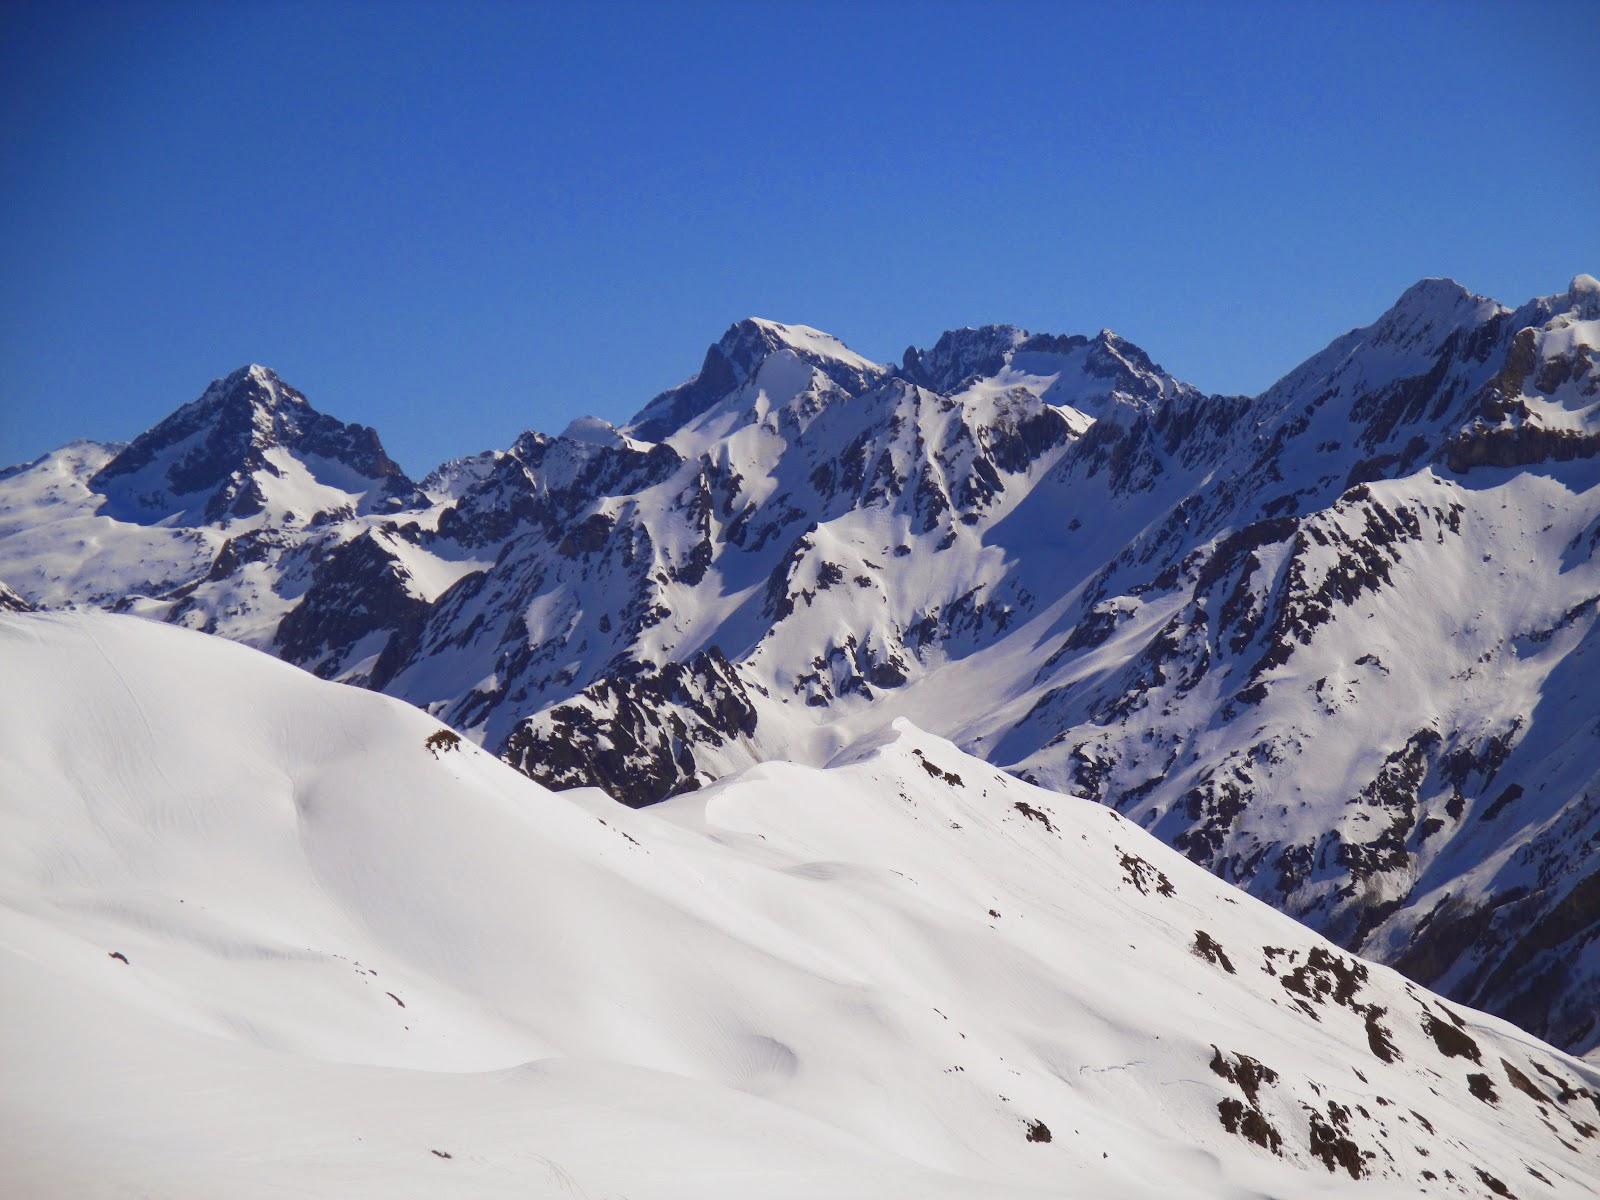 Puerto de Portalet: Pico Peyreget (2478m)